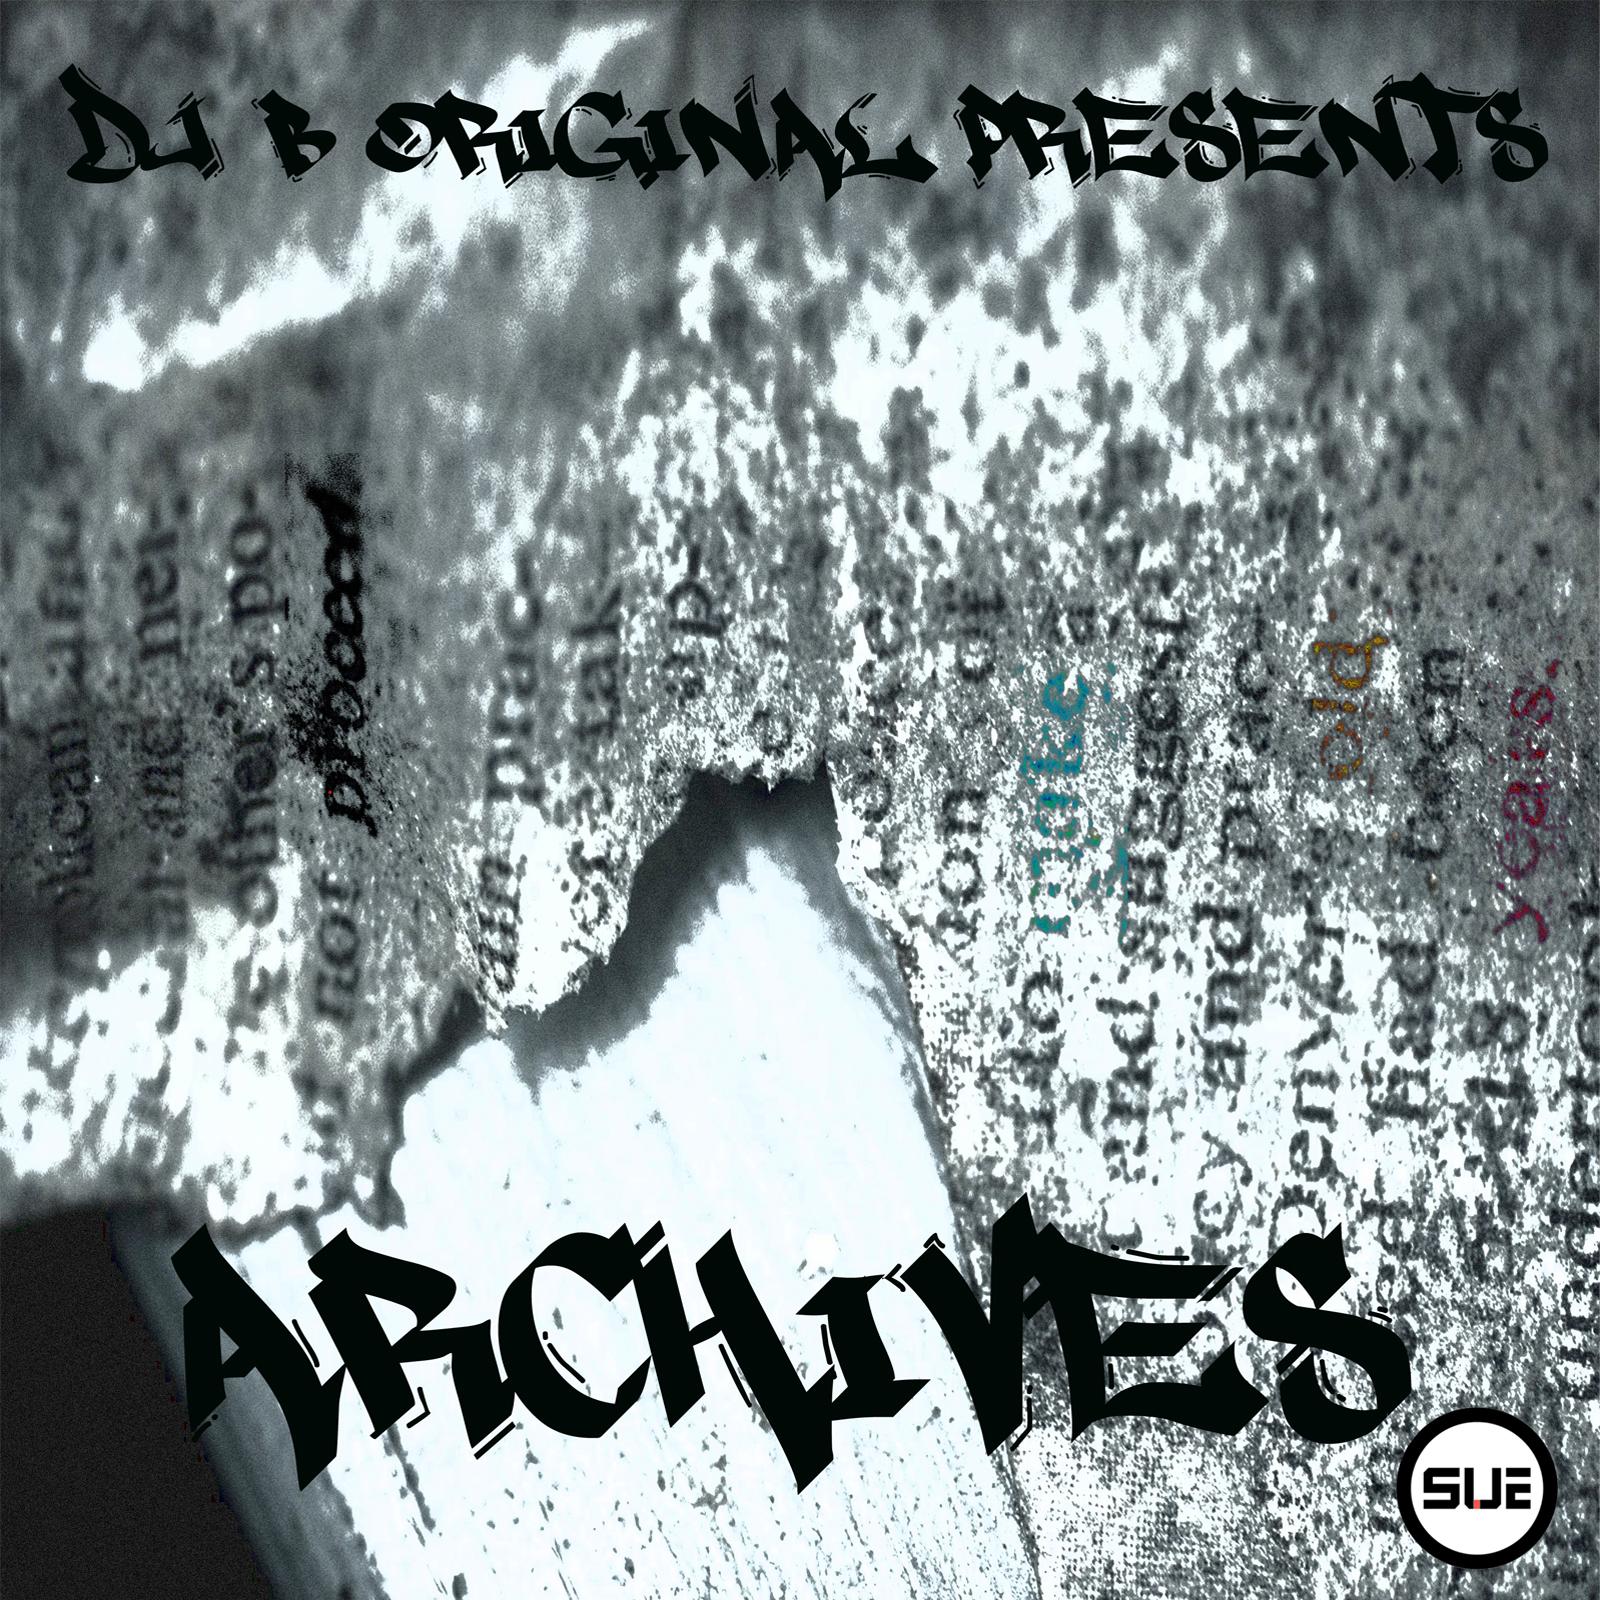 DJ B.Original Presents Archives